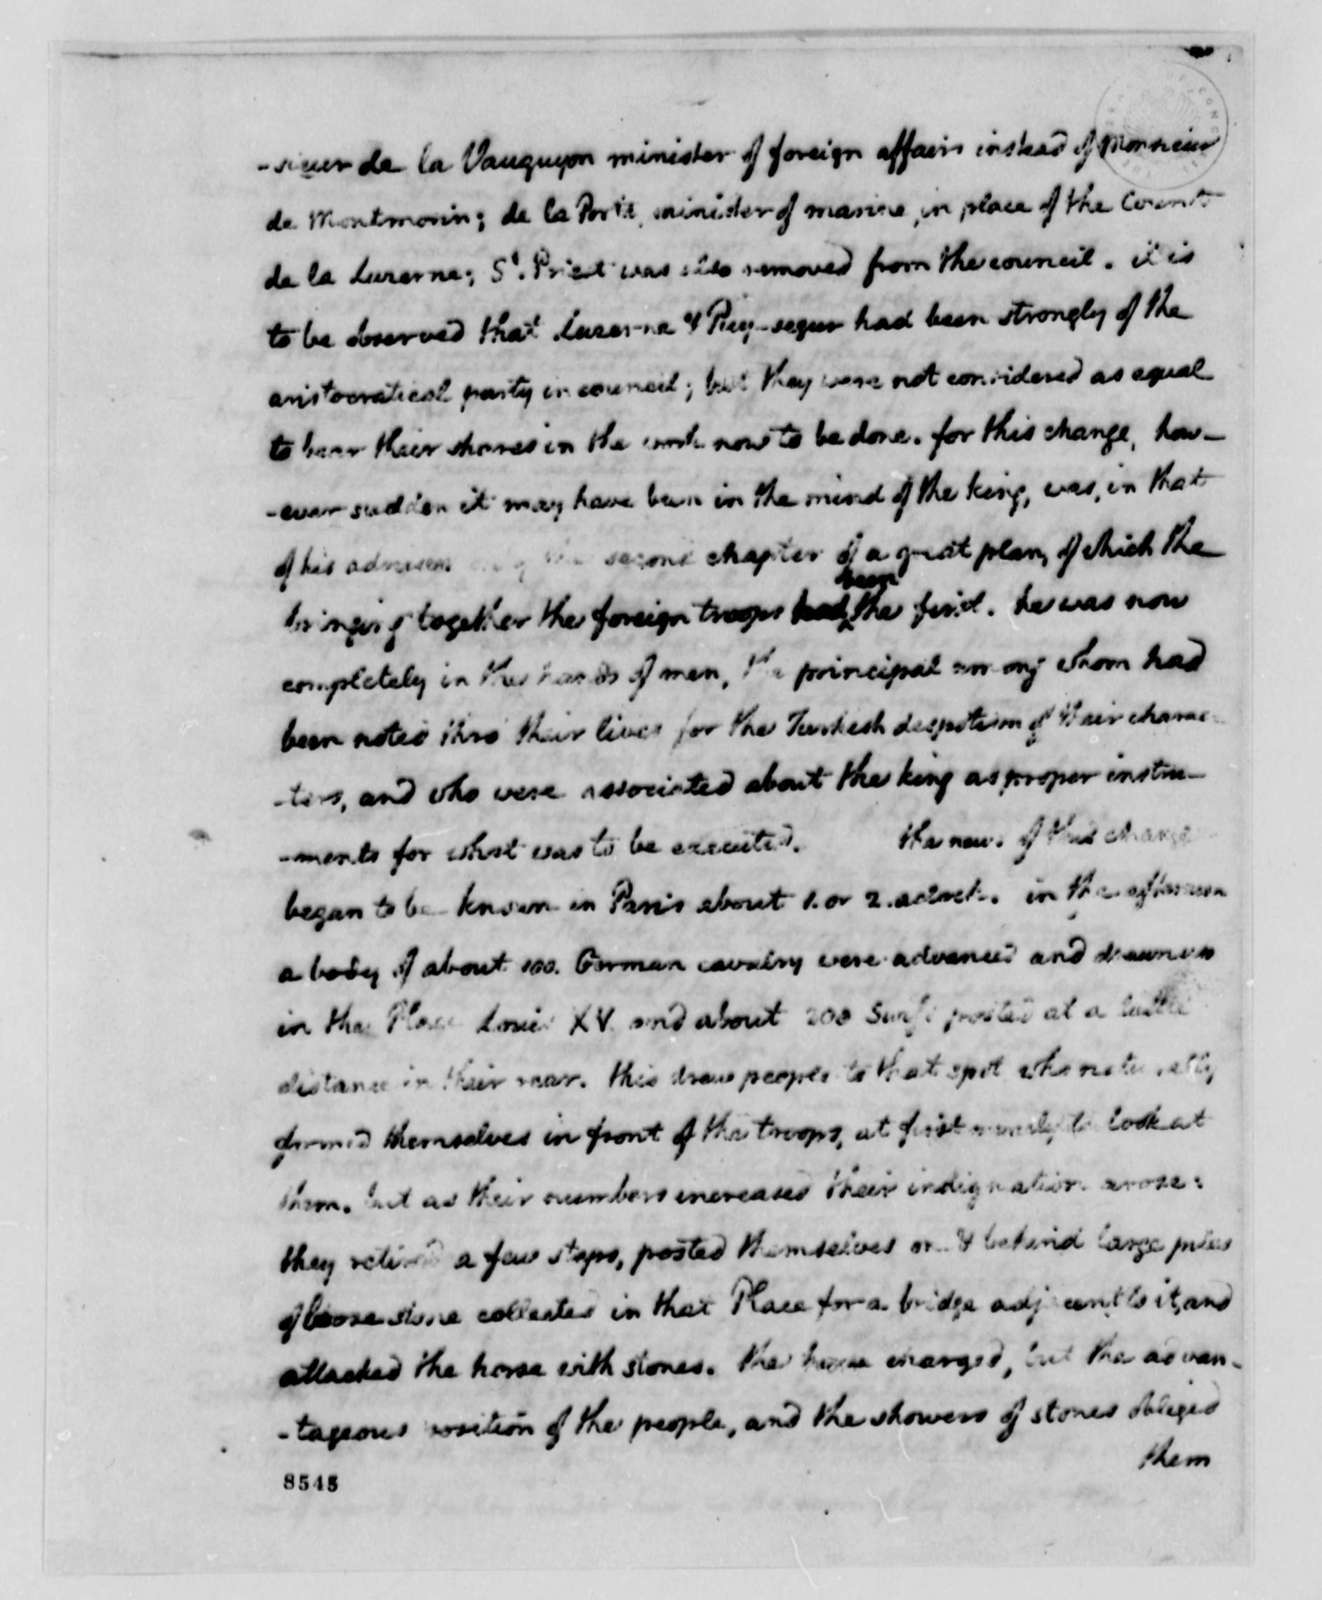 Thomas Jefferson to John Jay, July 19, 1789